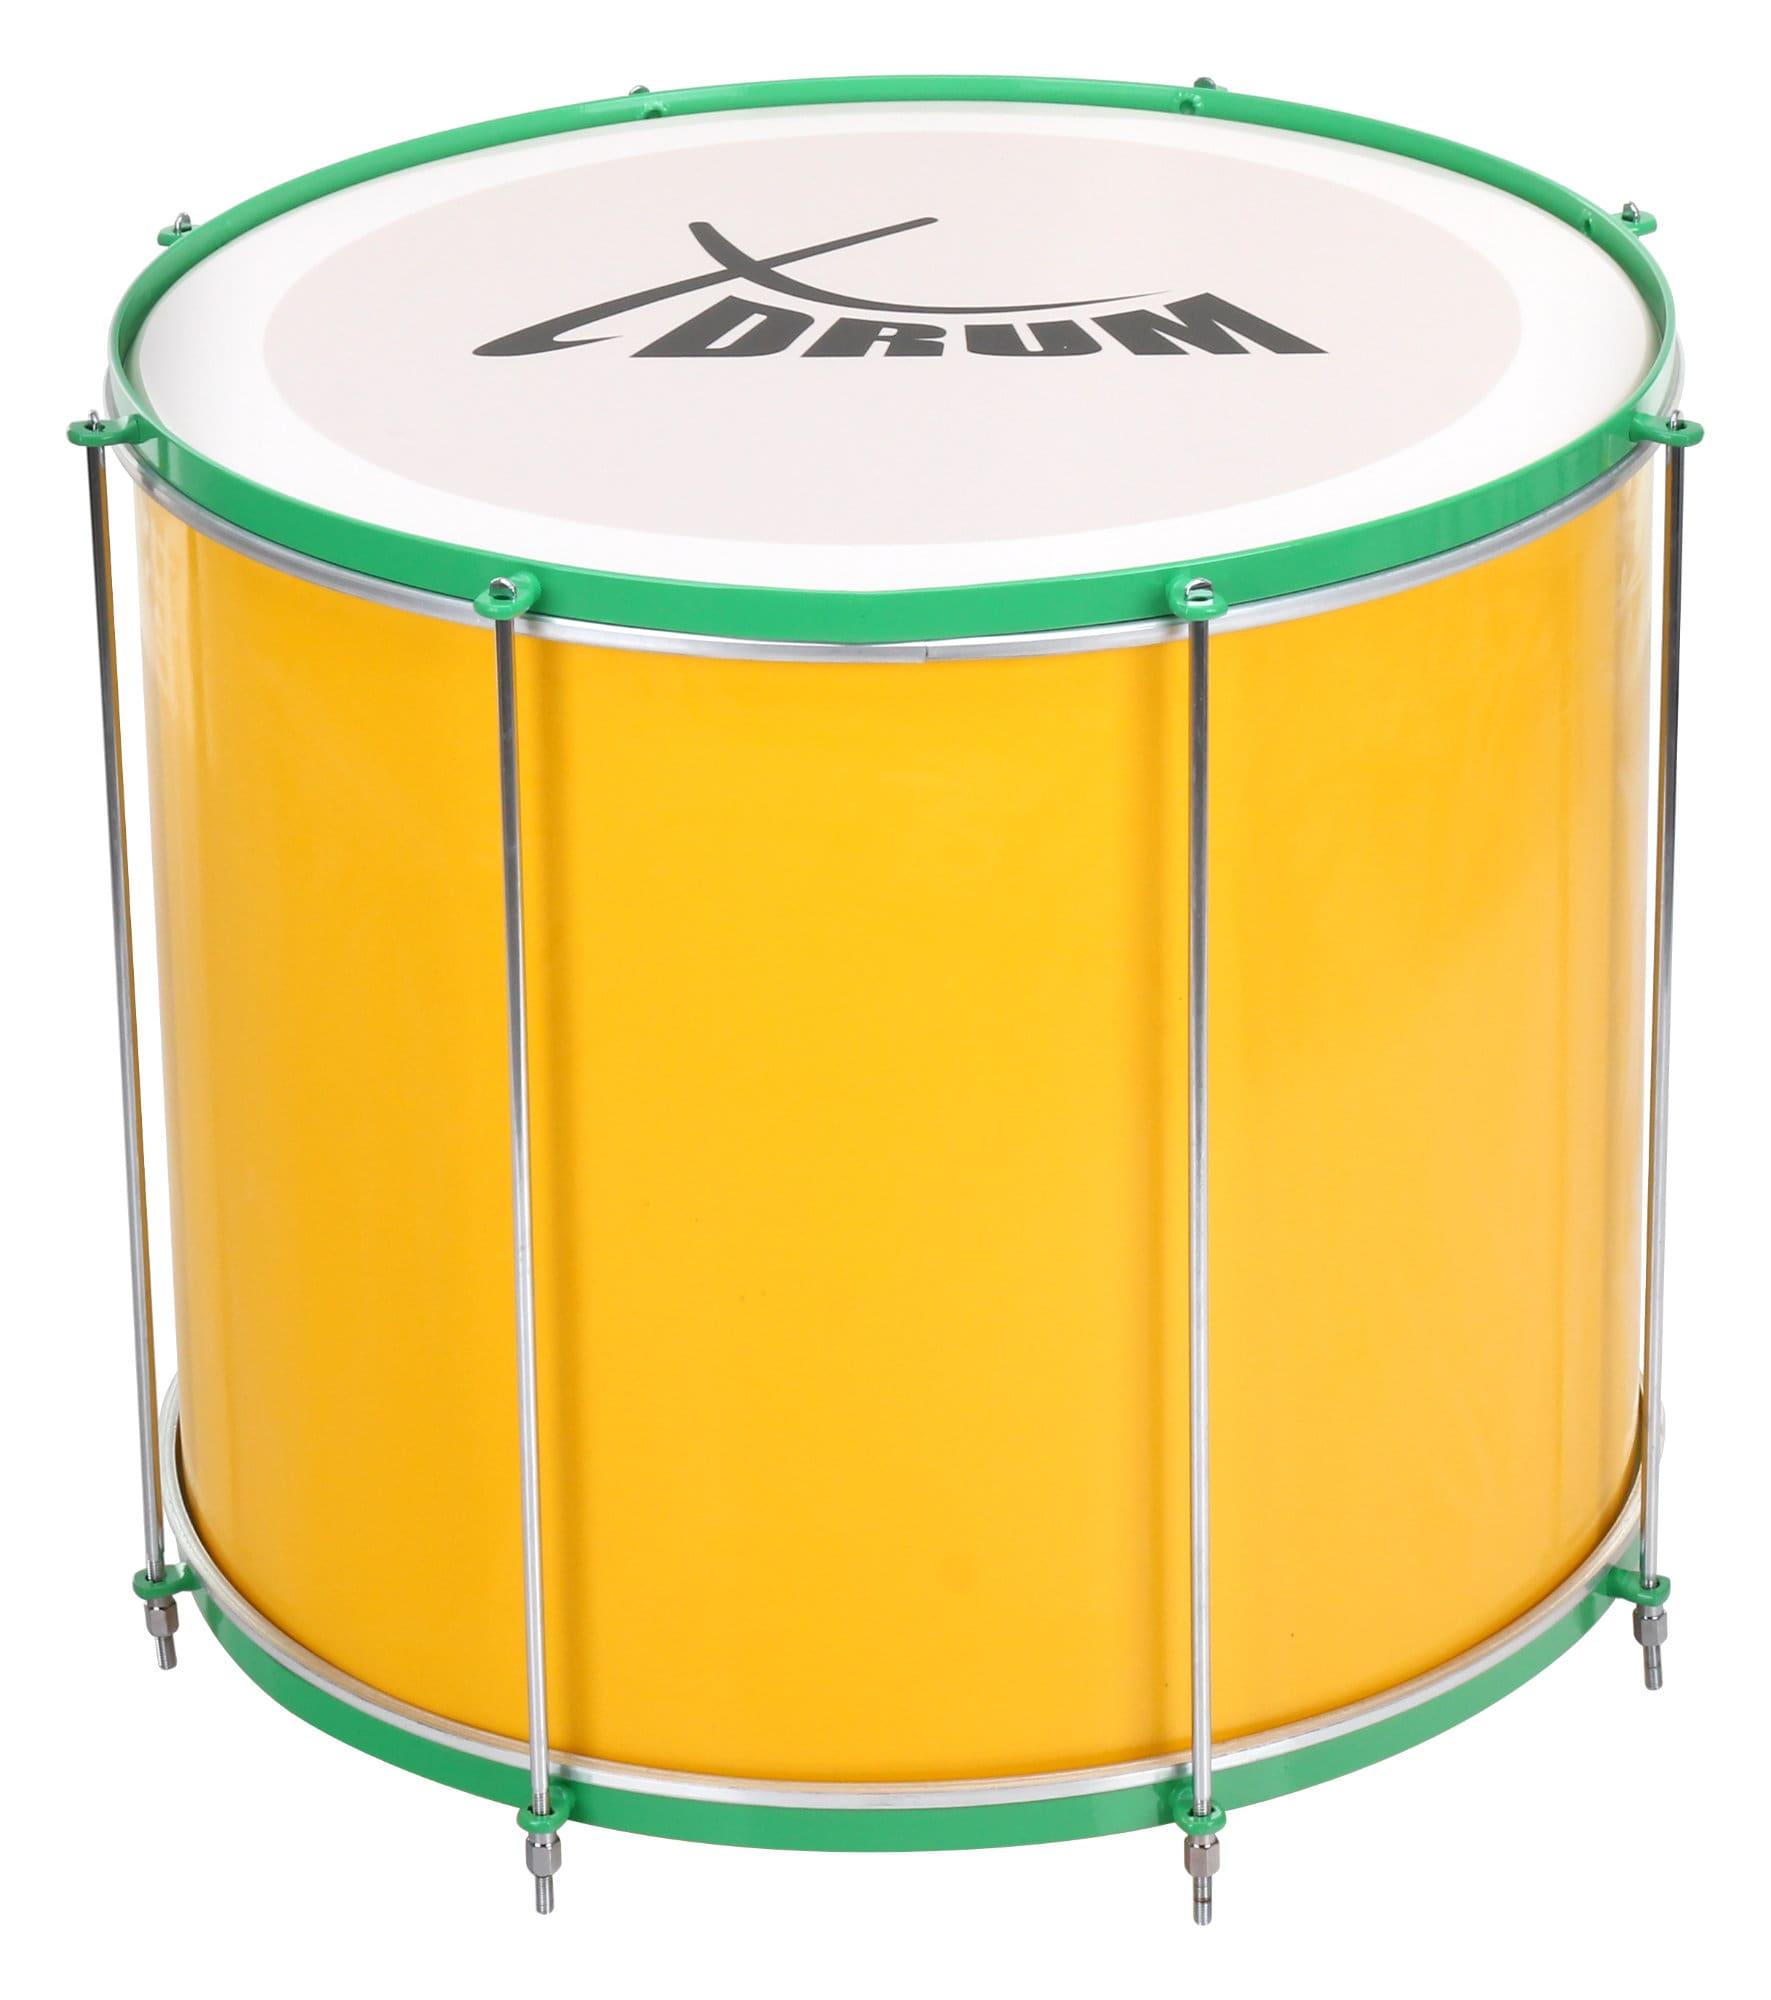 Marching - XDrum SSD 2016 Surdo Samba Trommel - Onlineshop Musikhaus Kirstein